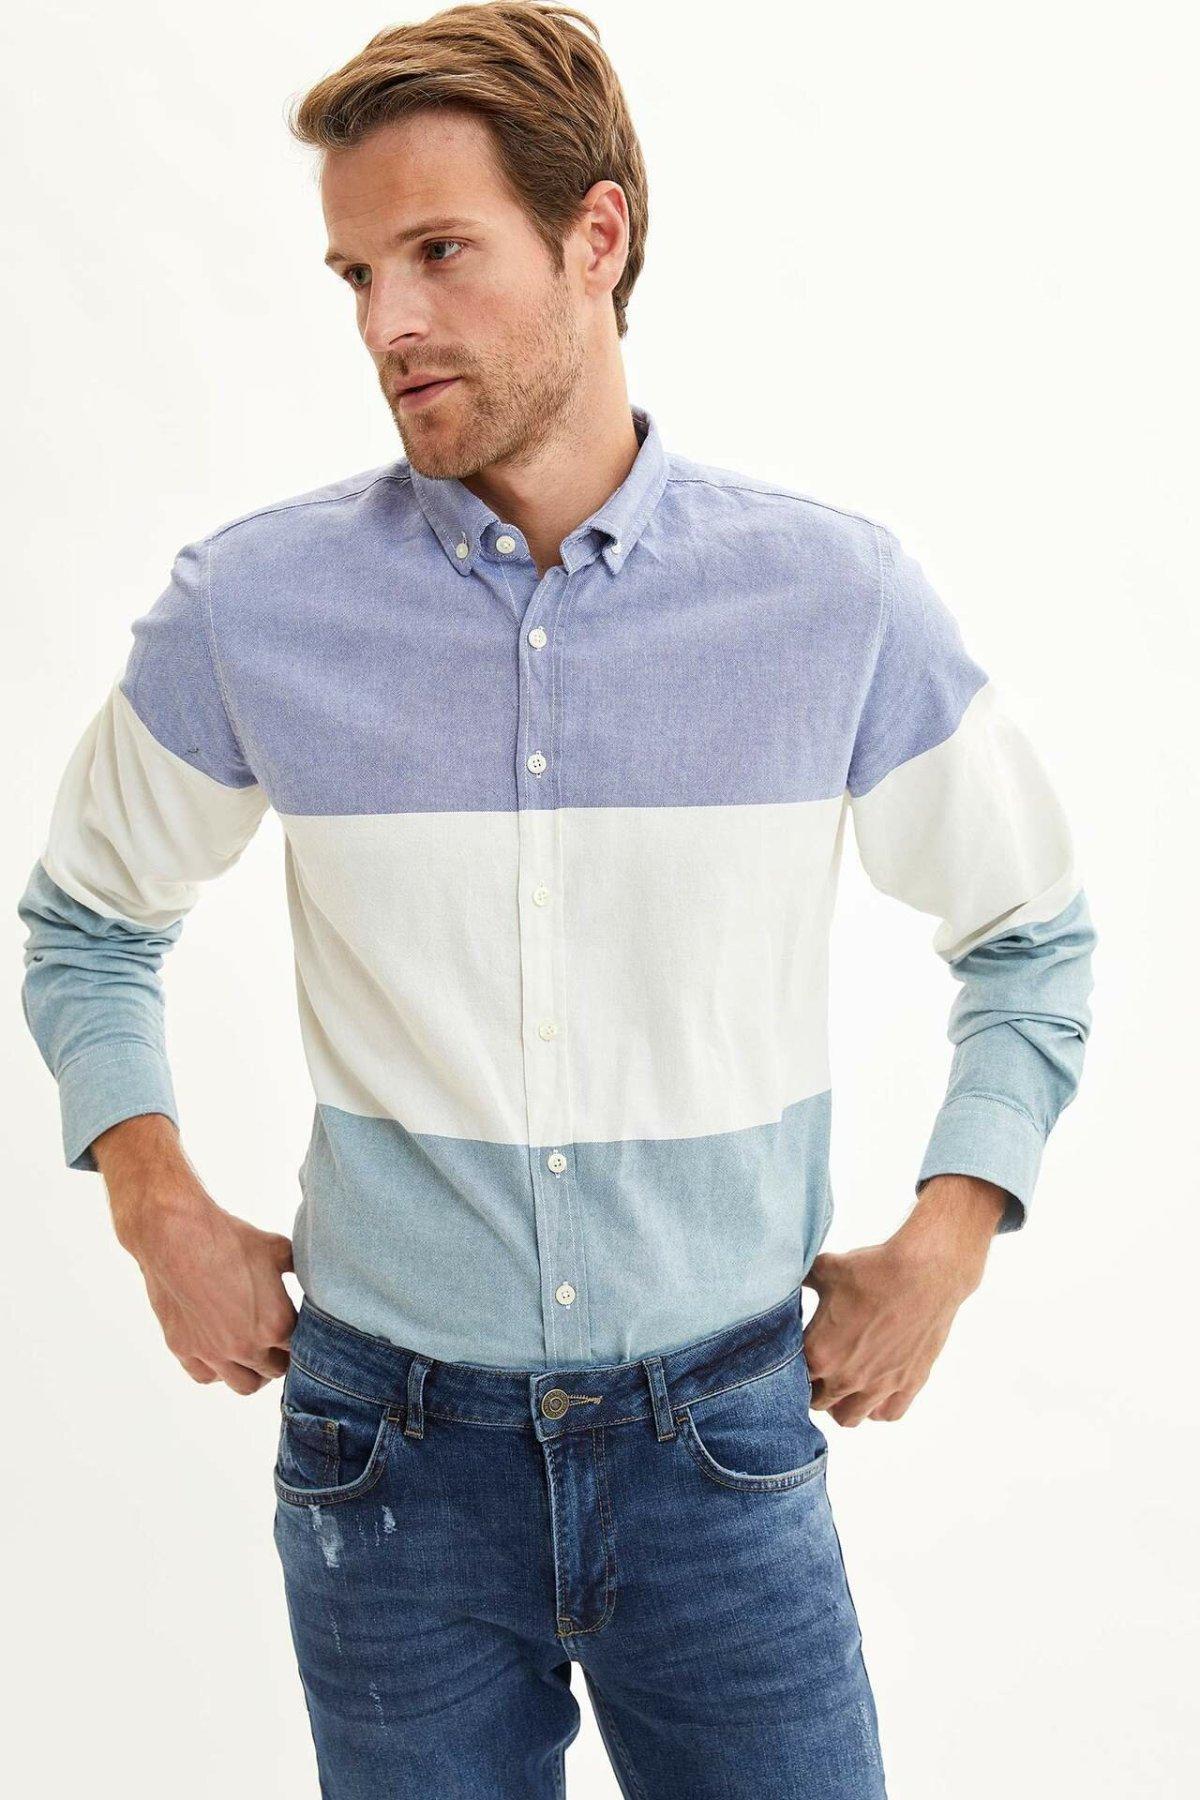 DeFacto Men Simple Striped Solid Shirts Long Sleeve Shirts Mens Casual Lapel Collar Casual Shirt Tops New-L6273AZ19AU